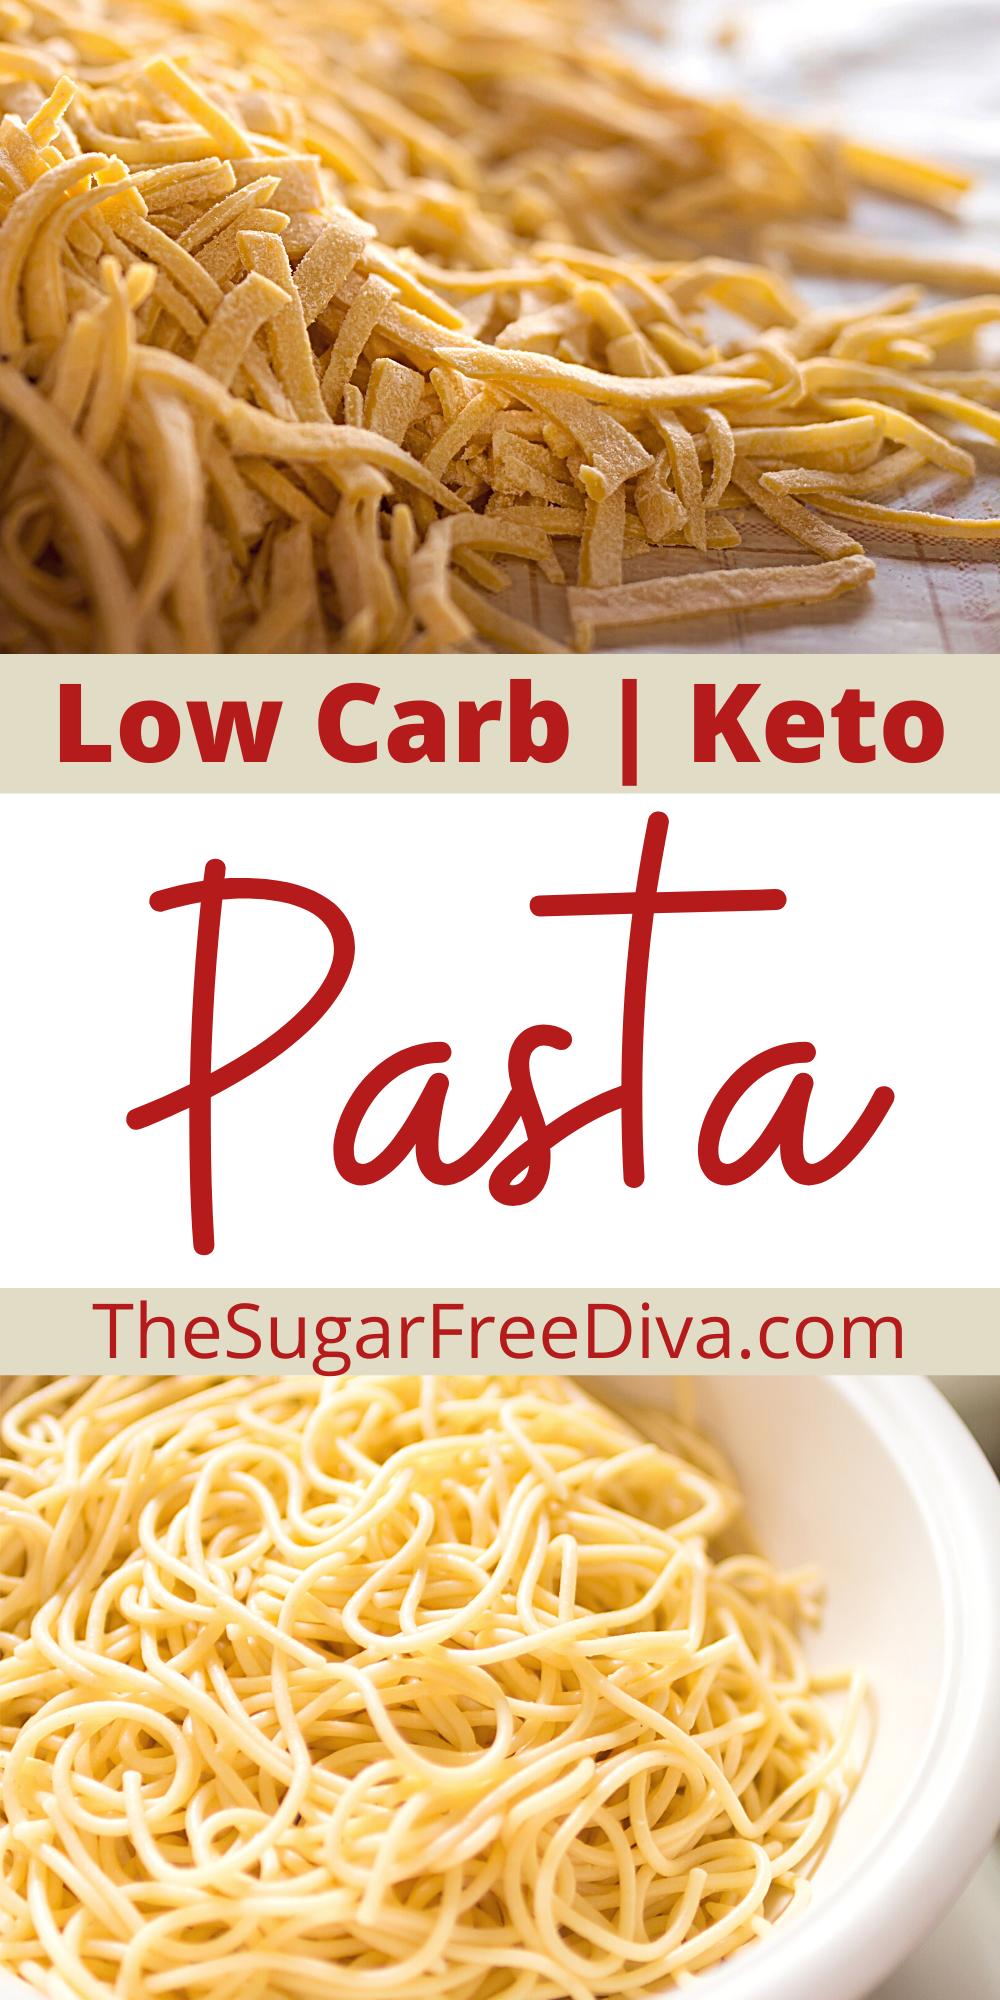 pasta for sugar free diet